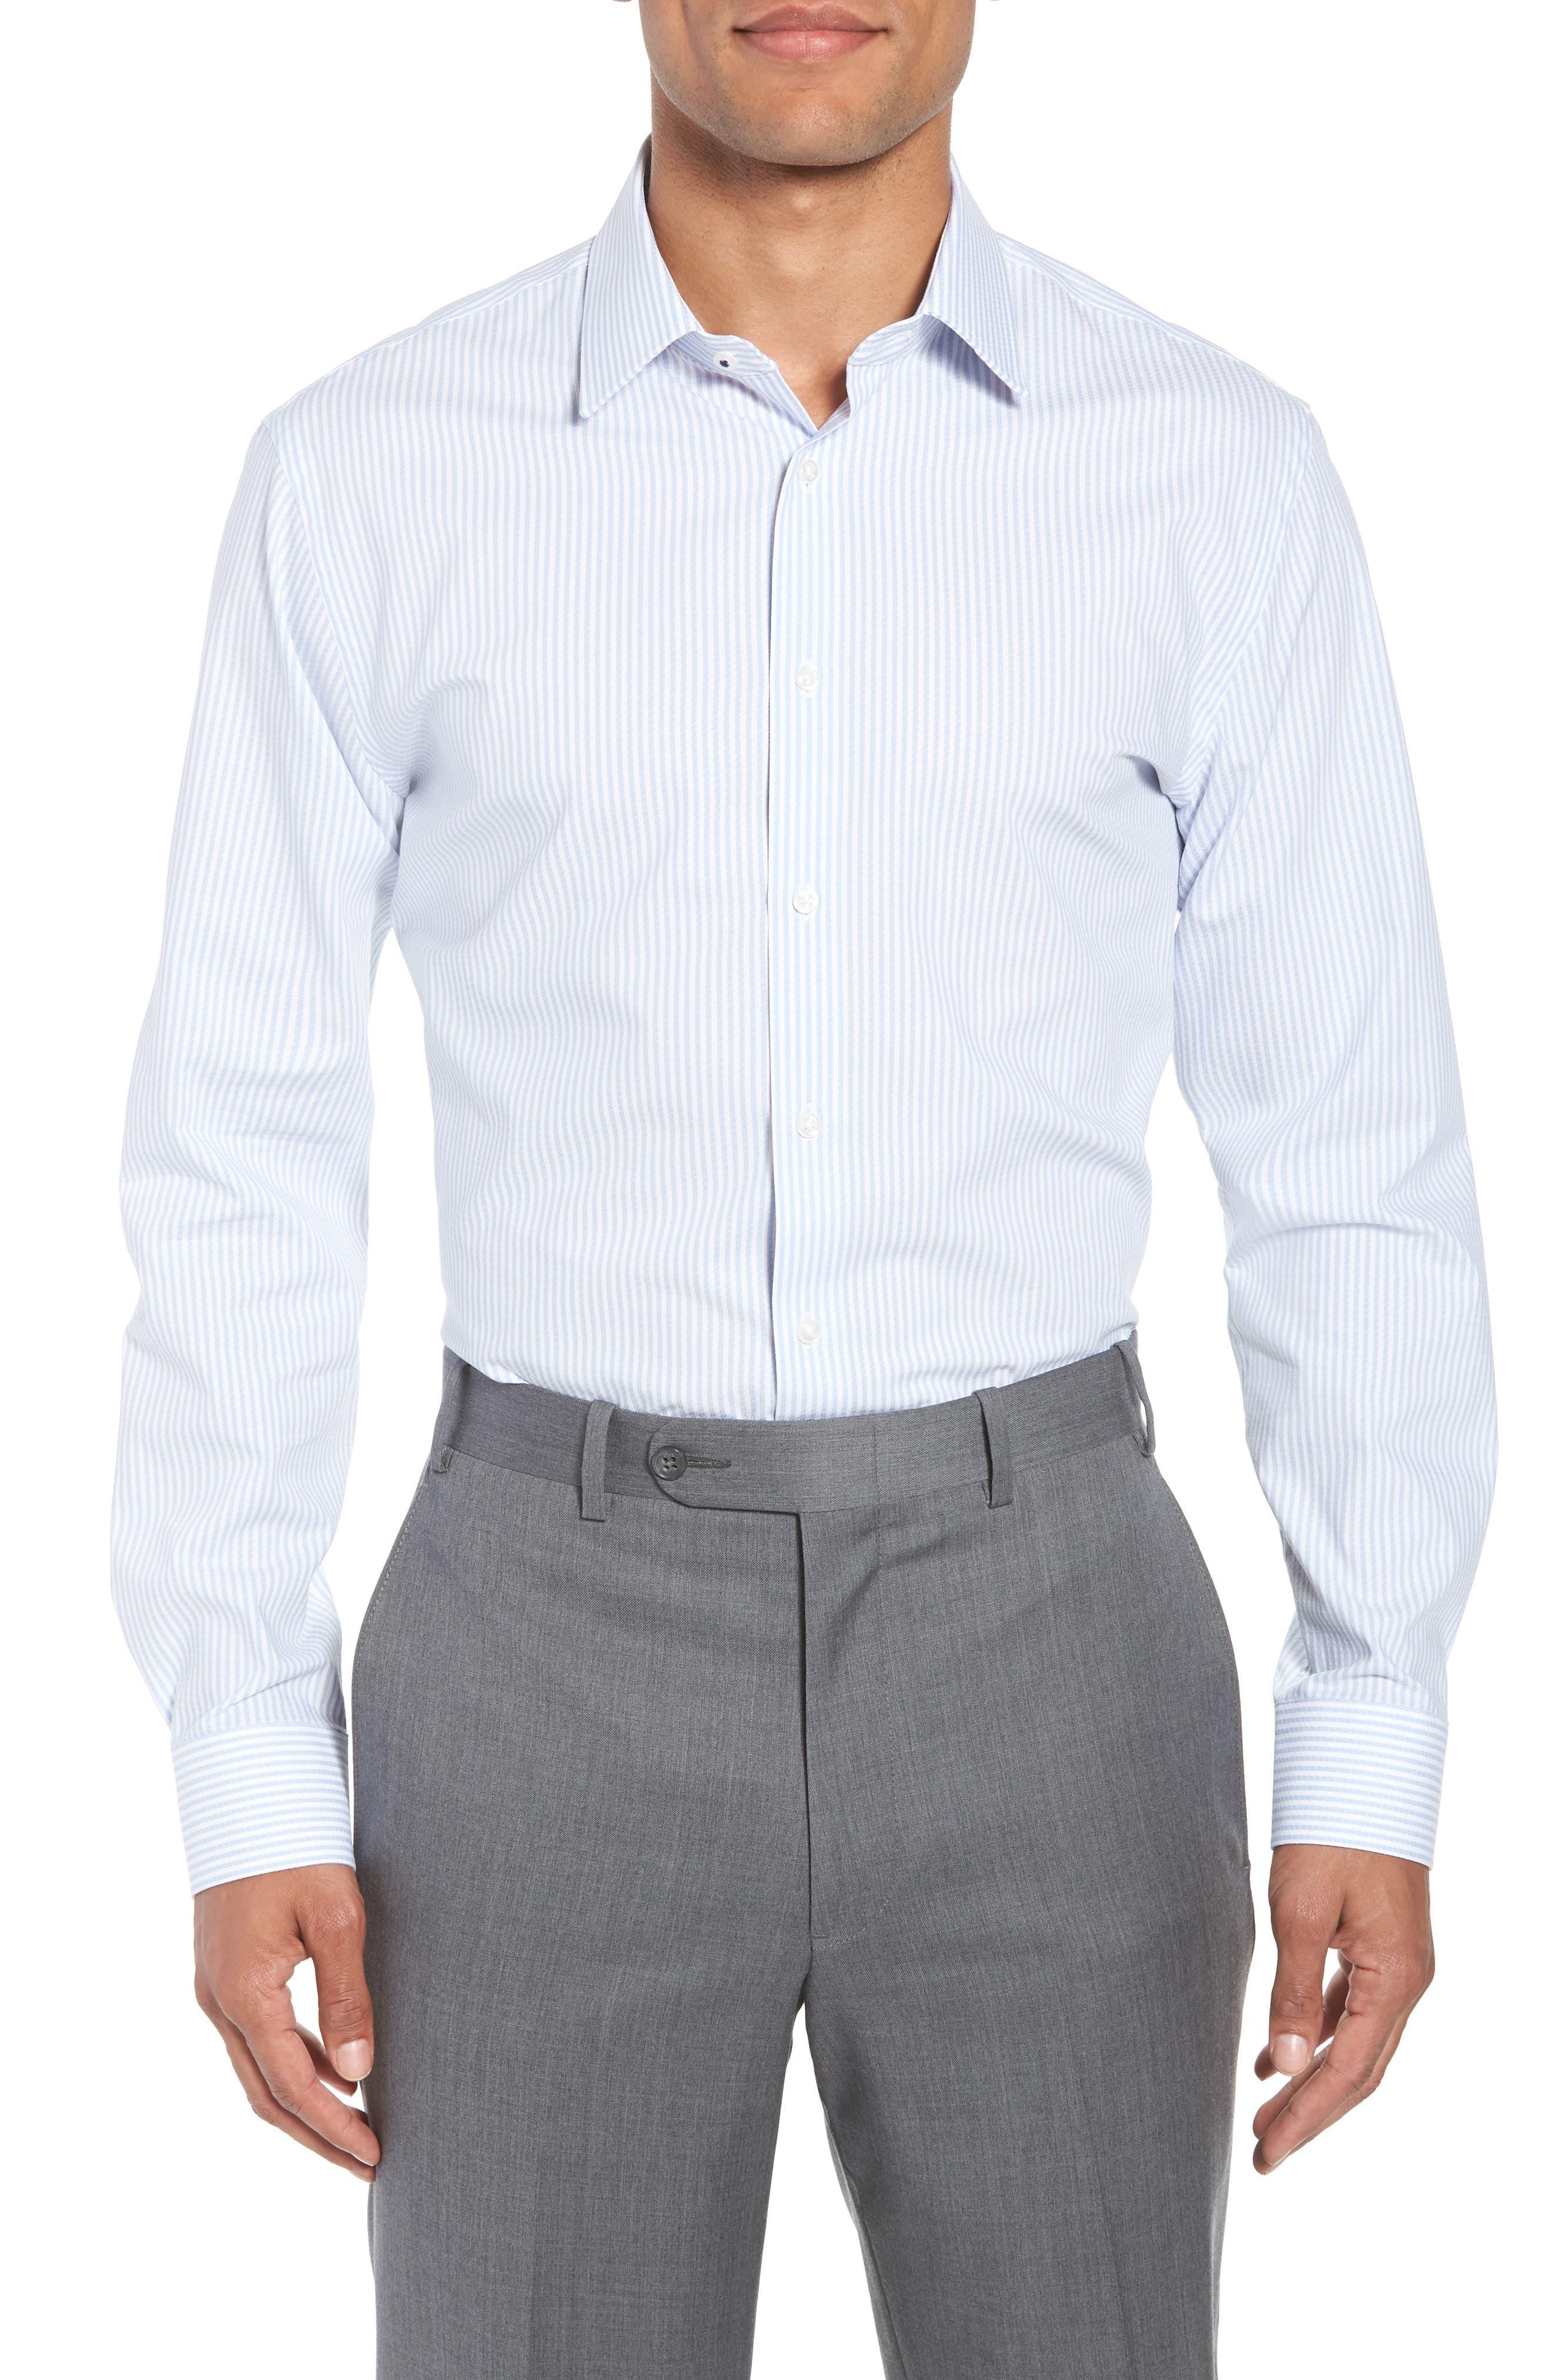 Tech-Smart Trim Fit Stripe Stretch Dress Shirt,                             Main thumbnail 1, color,                             Blue Brunnera